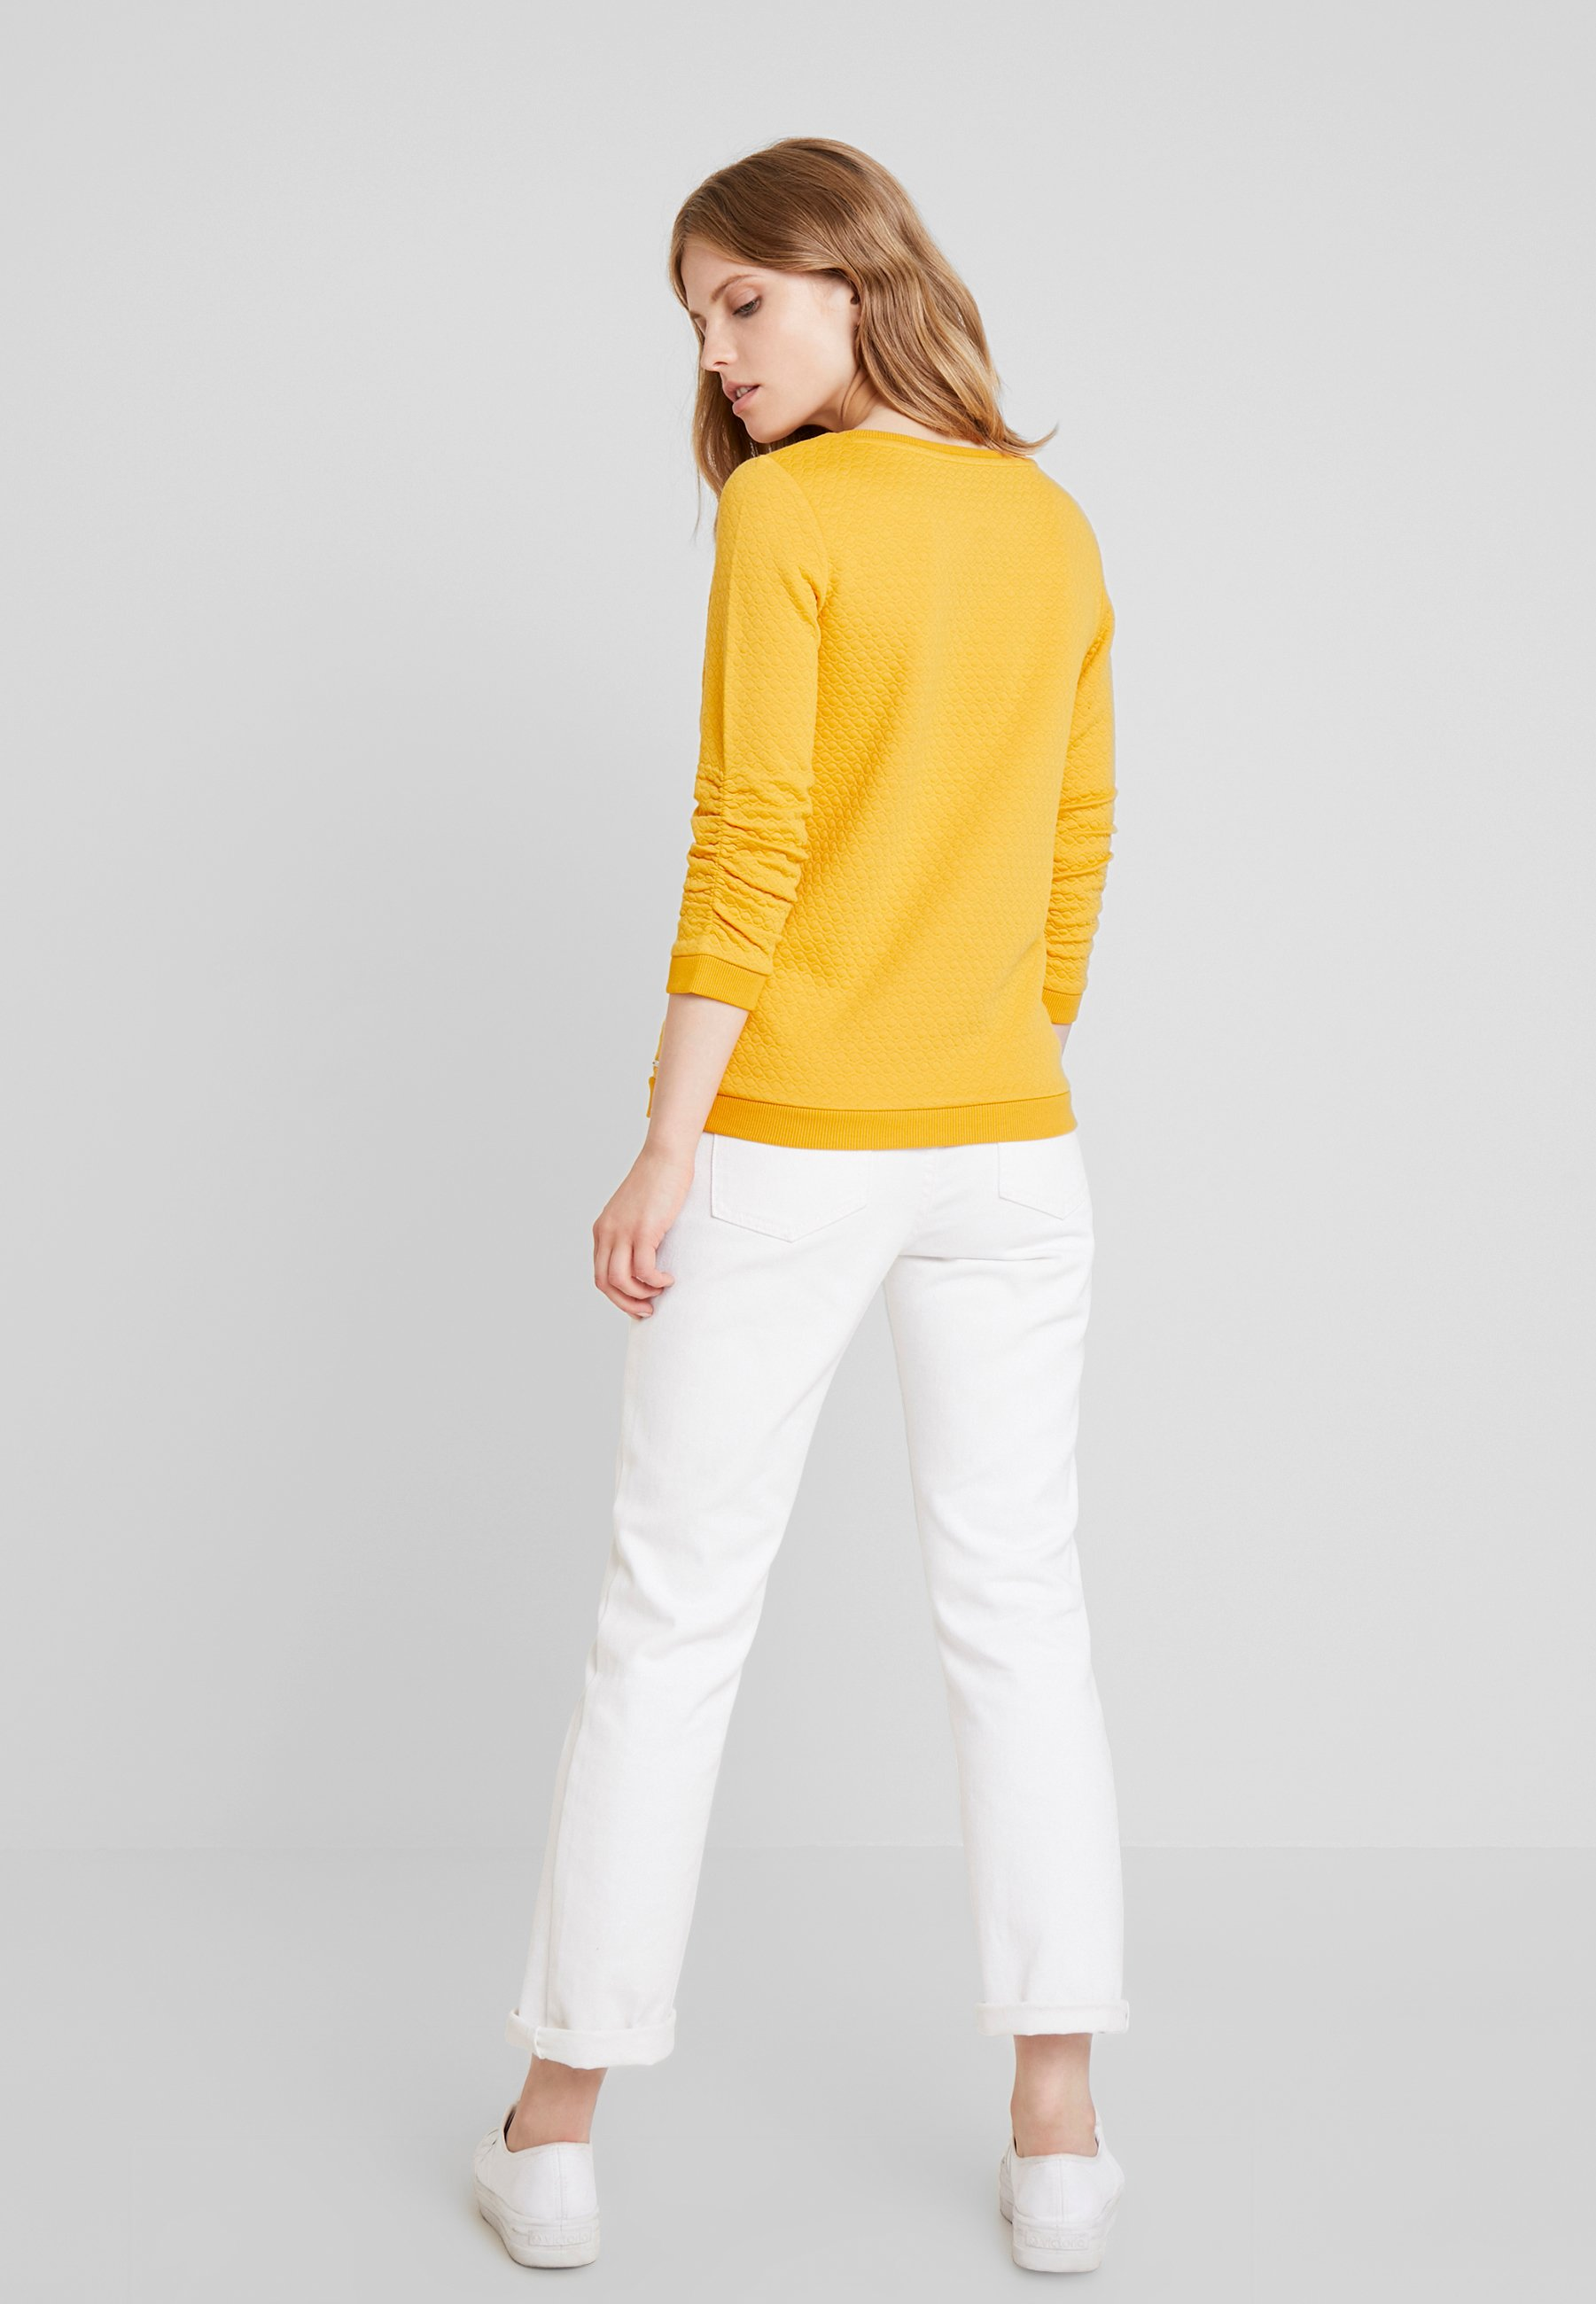 TOM TAILOR DENIM STRUCTURED - Topper langermet - sunflower yellow